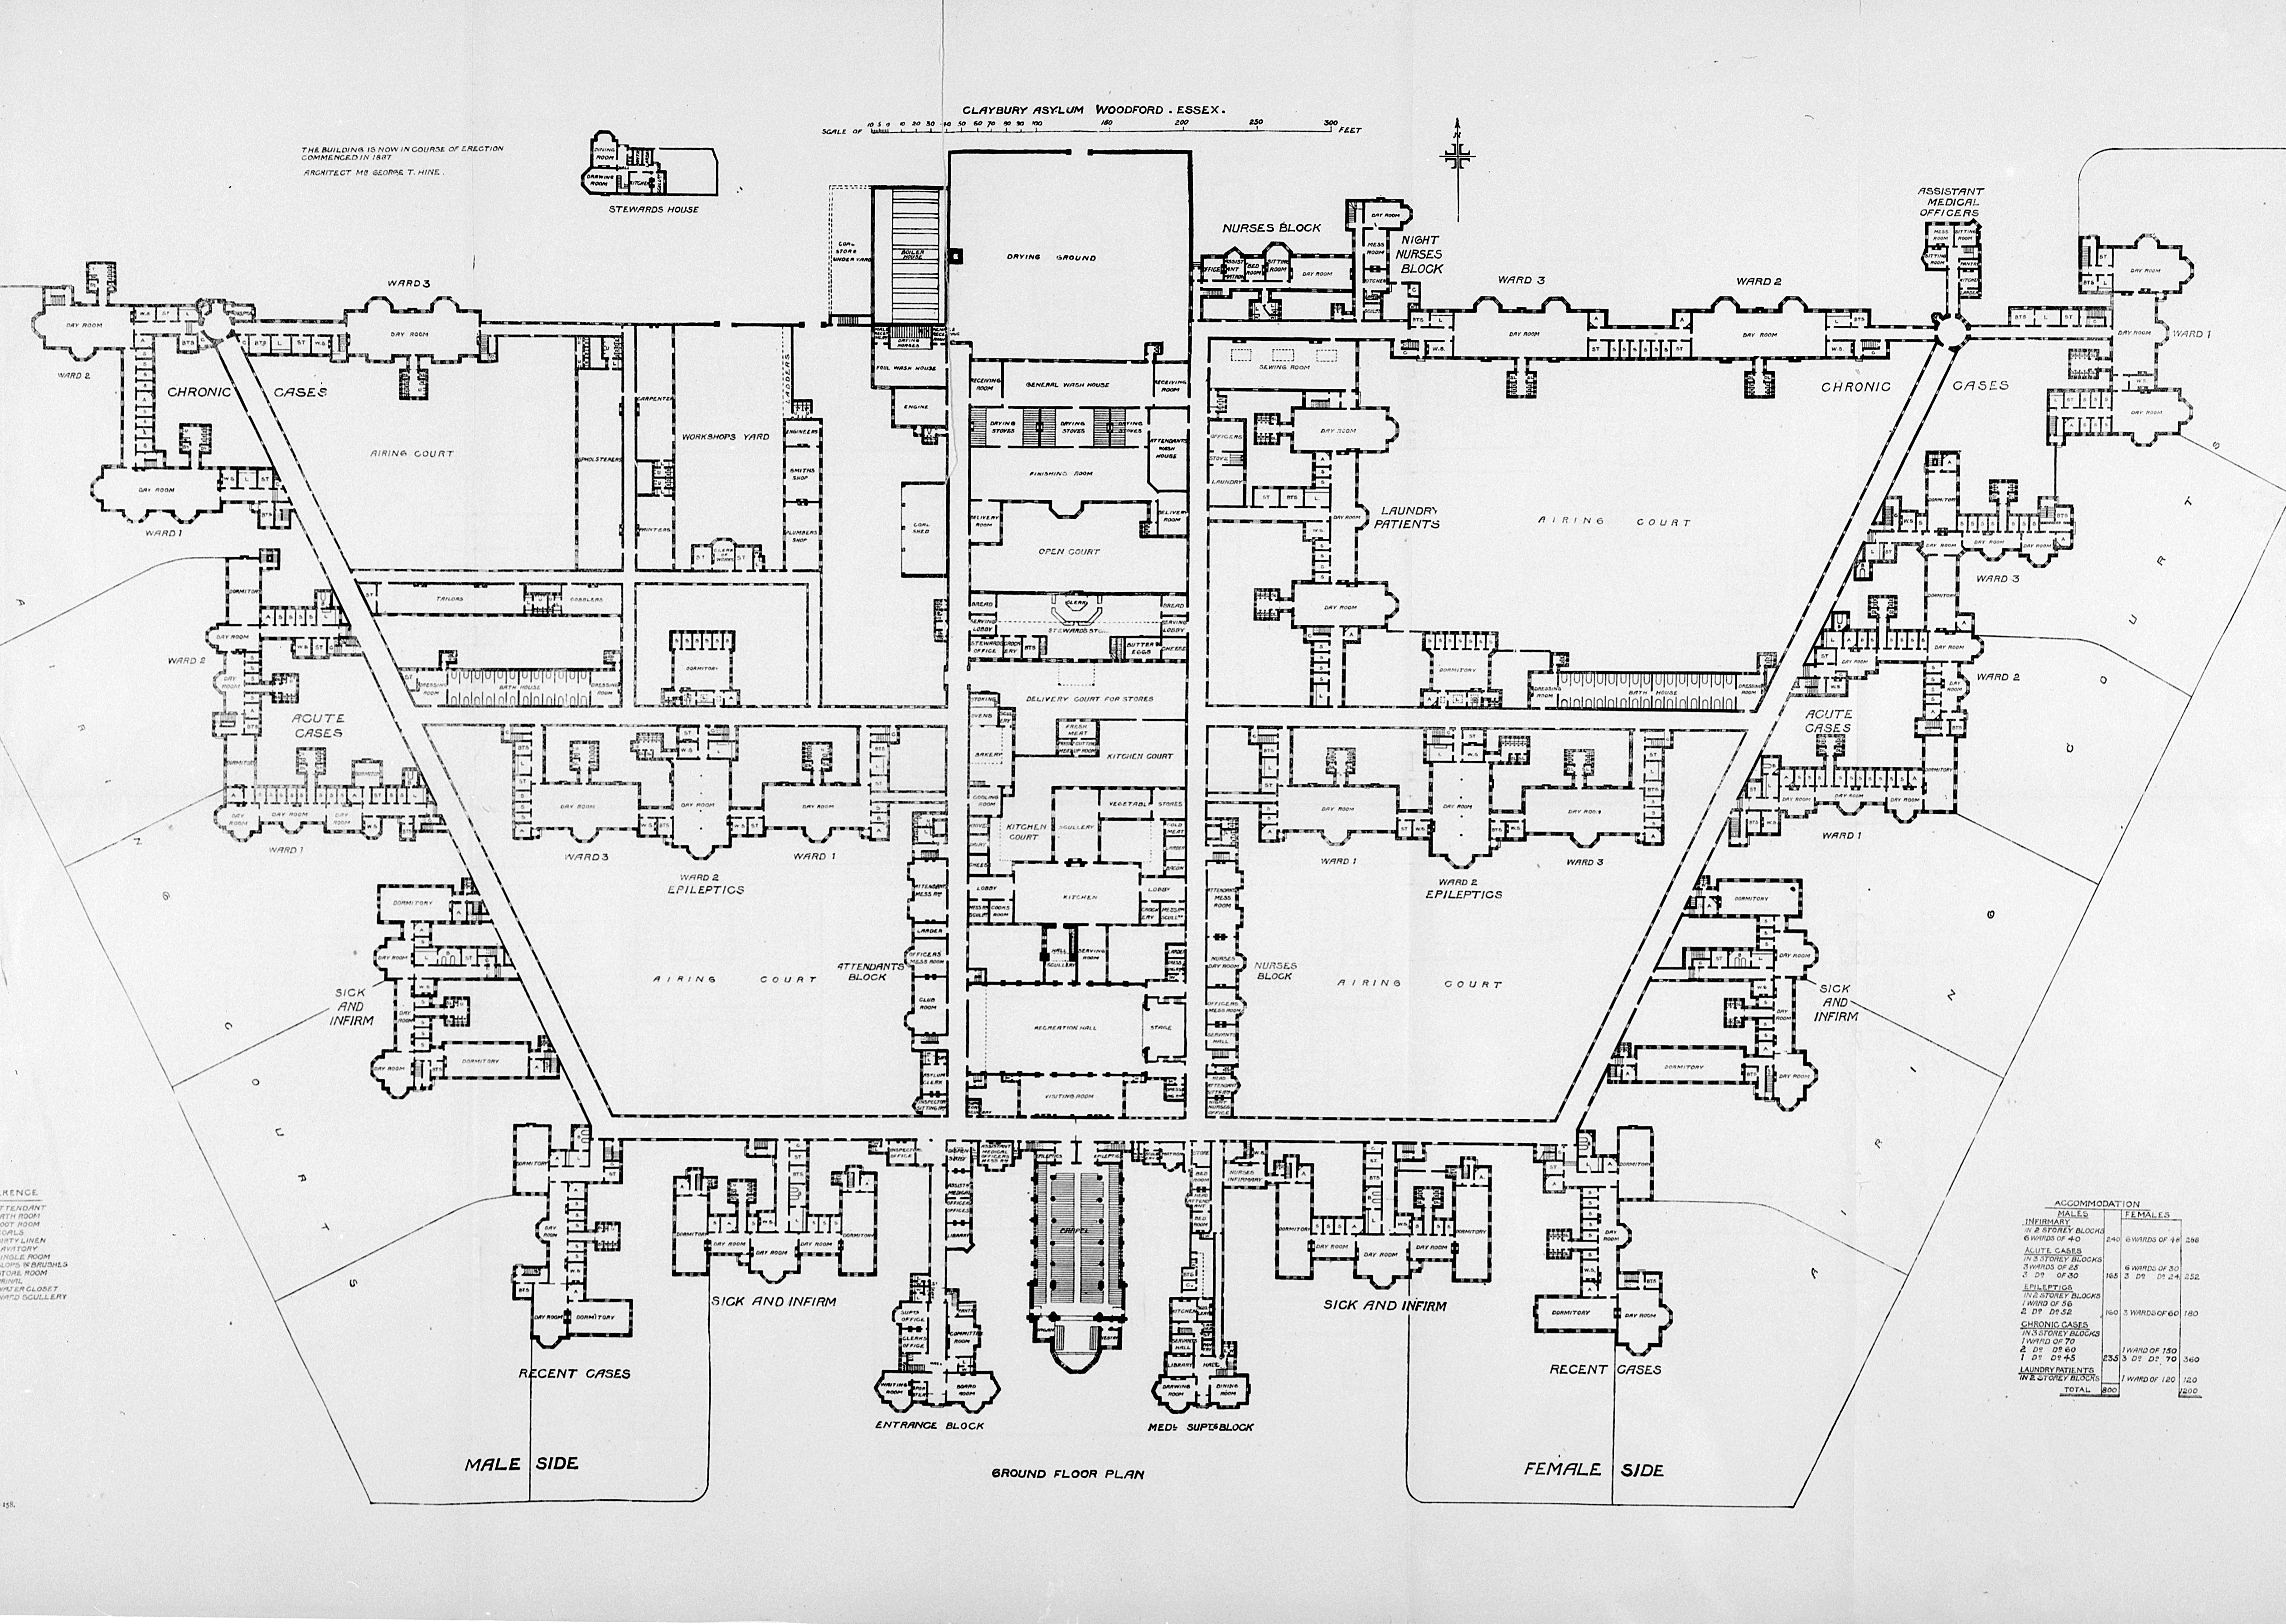 Claybury Asylum Ground Floor Plan Wellcome